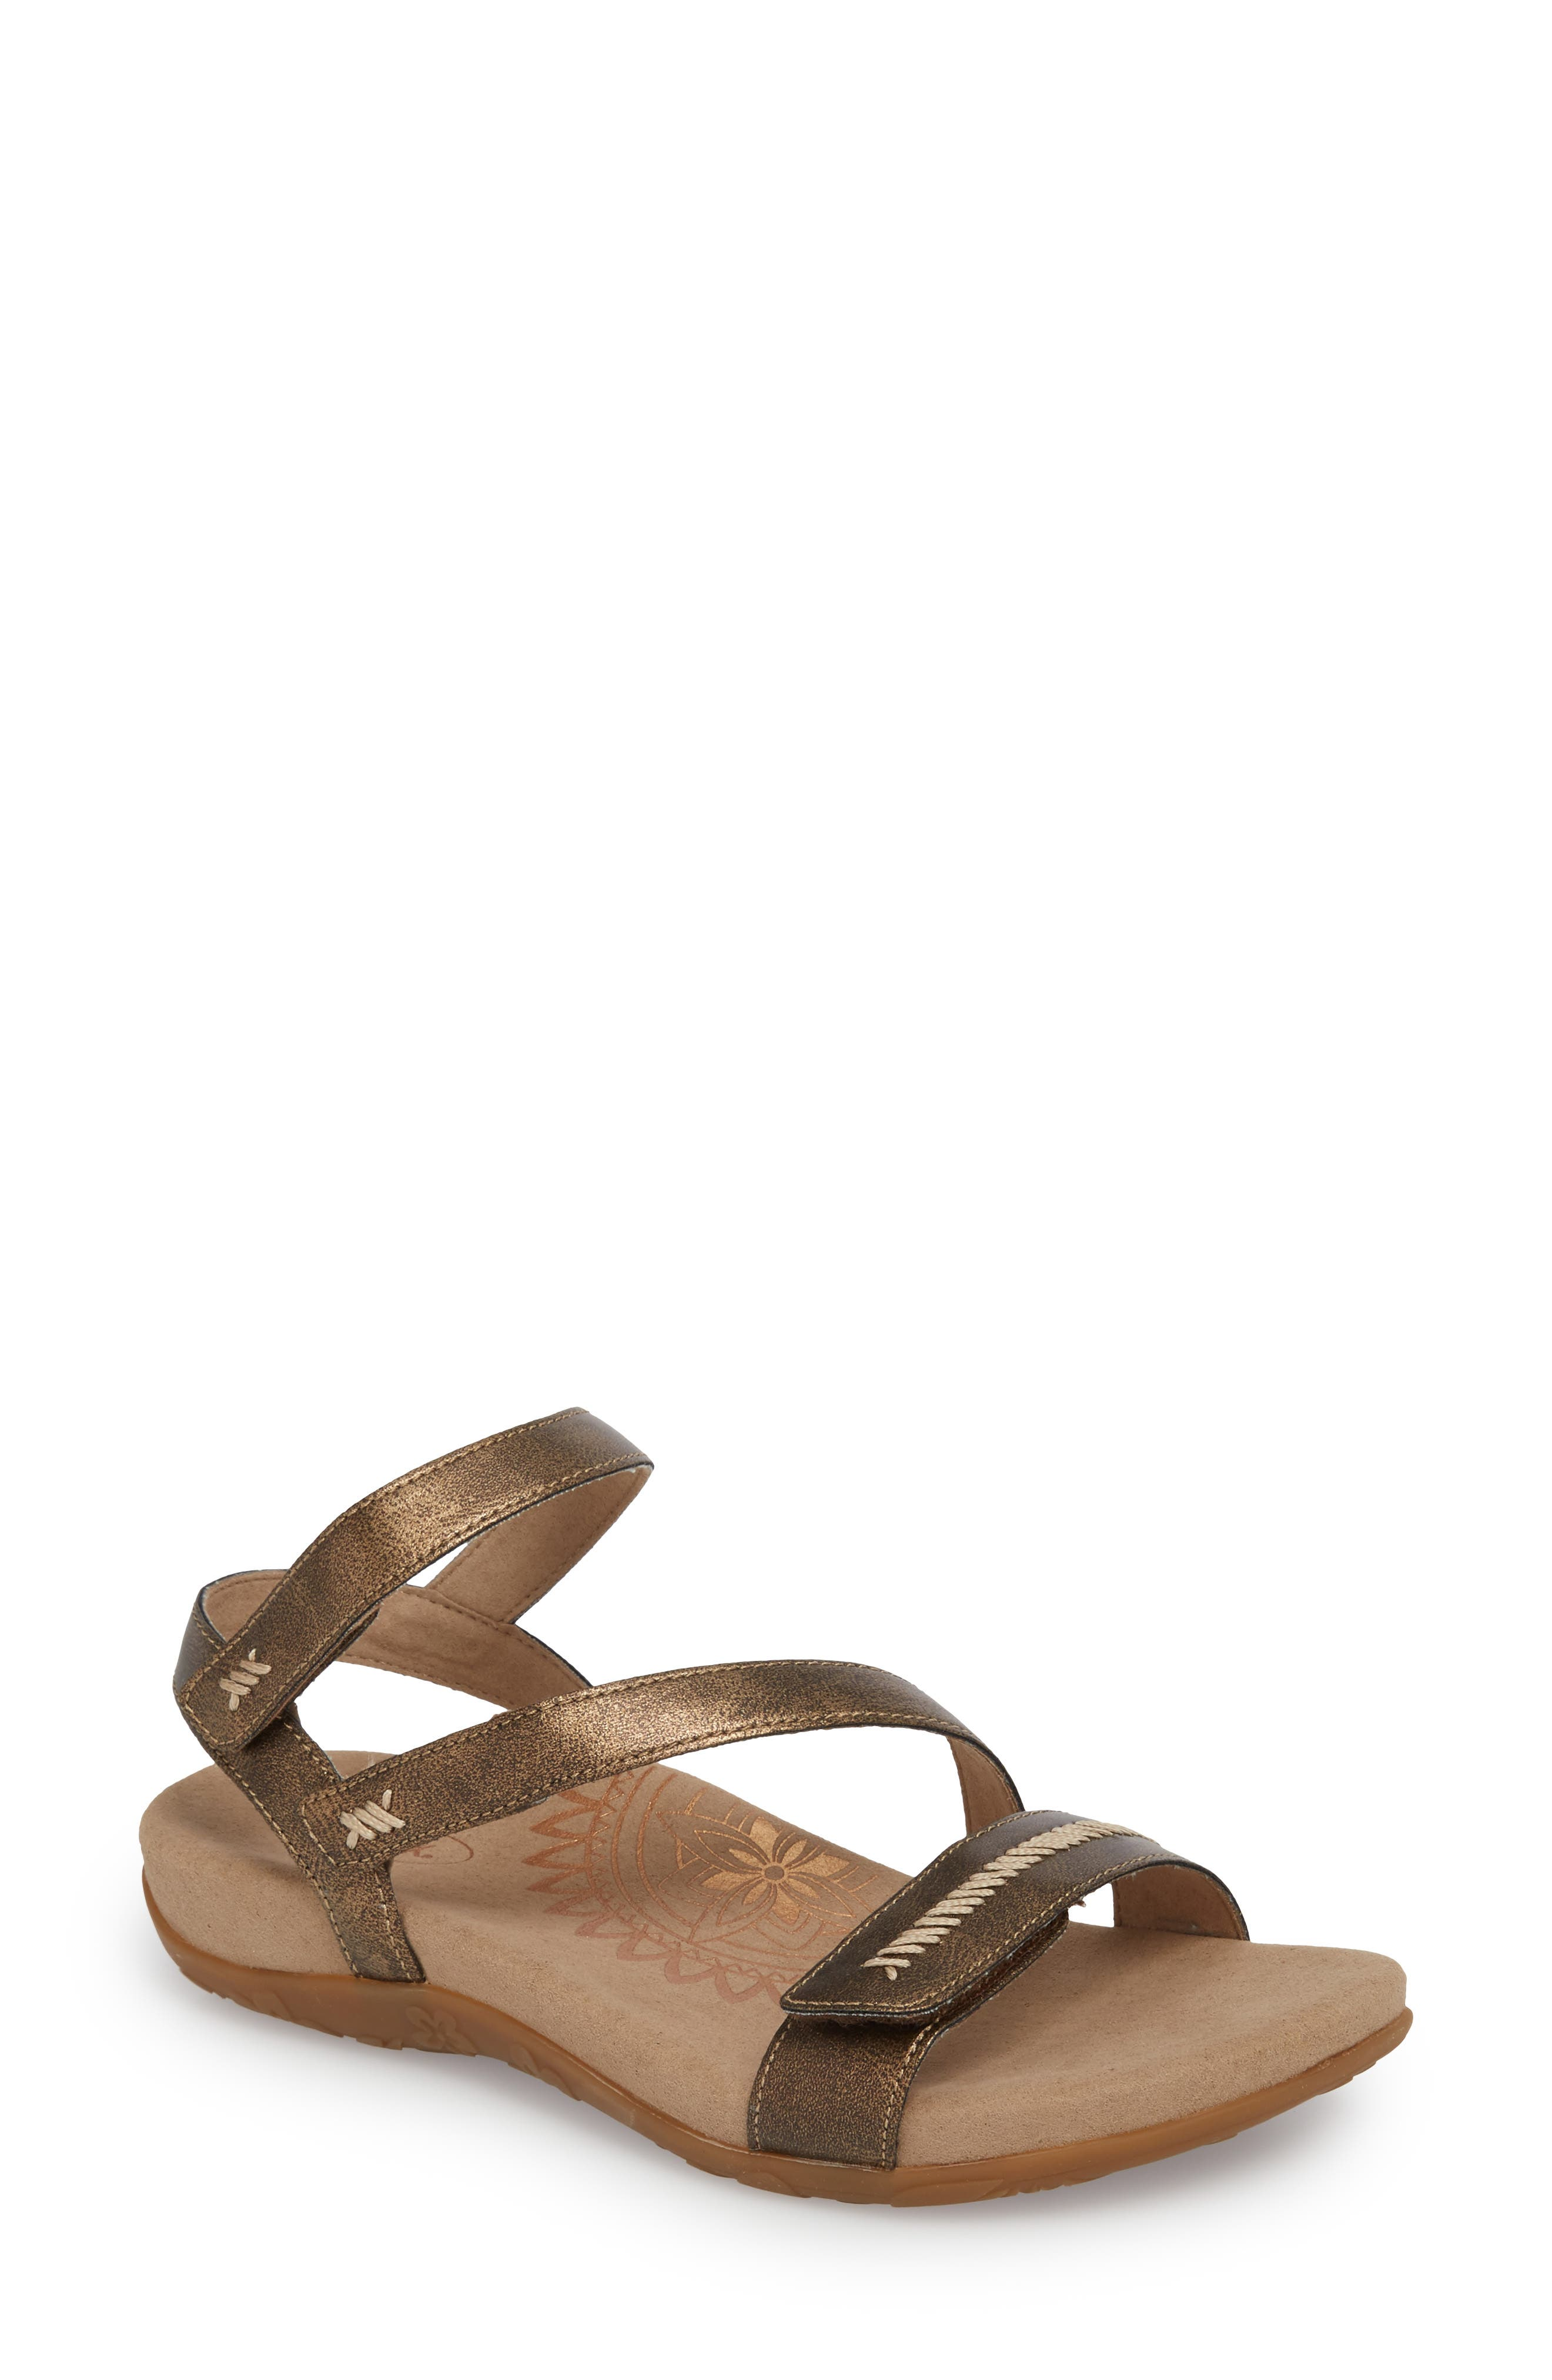 Gabby Sandal,                             Main thumbnail 1, color,                             Bronze Leather